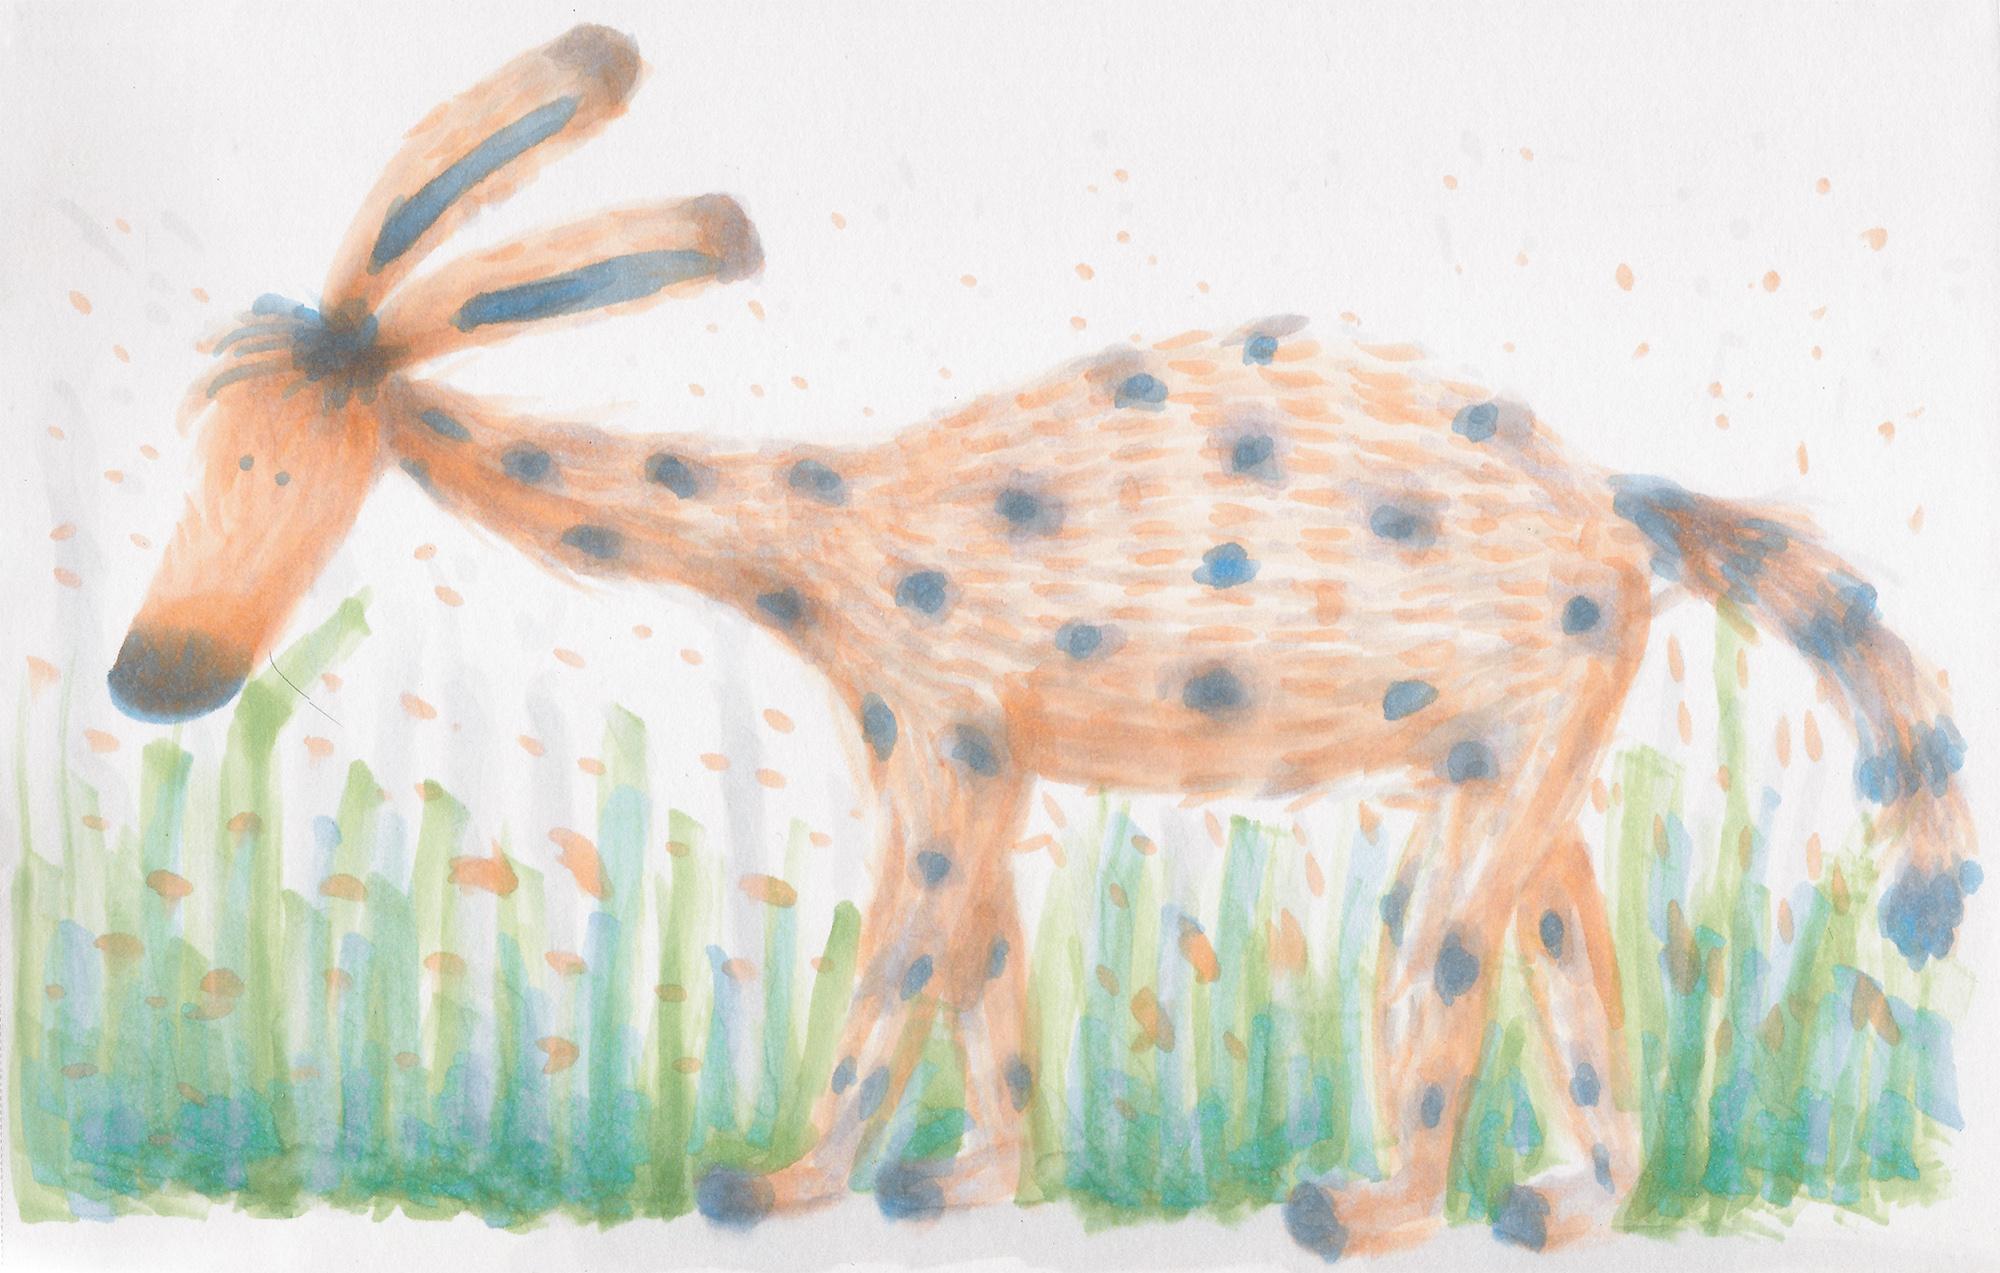 Chen-Huan Tsai (Julia Tsai) - The Kelopkelopepe by Tall Grass